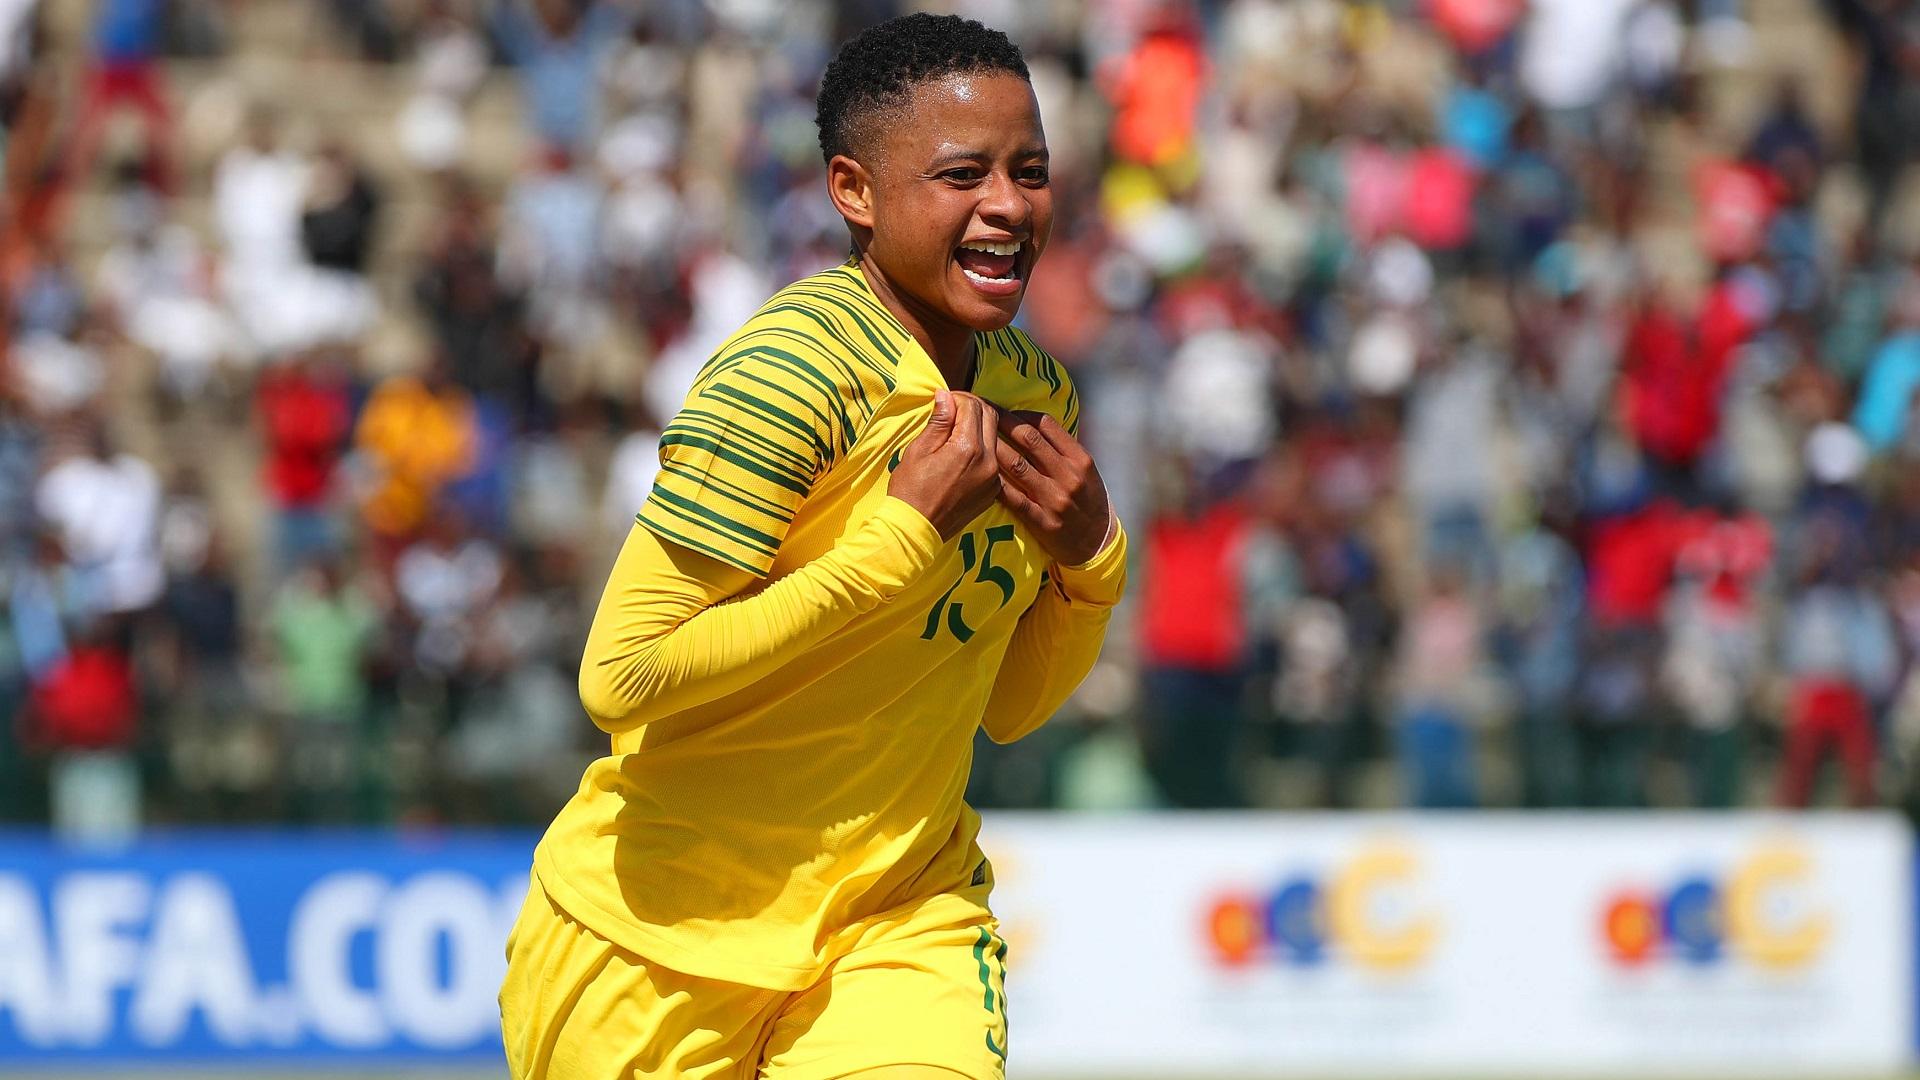 refiloe-jane-of-south-africa-2018-cosafa-womens-championship -22-september-2018 wh6g7scfpfpw1oxq6j01vzwjl.jpg t -280437610 quality 100 f287c89dfb2c5